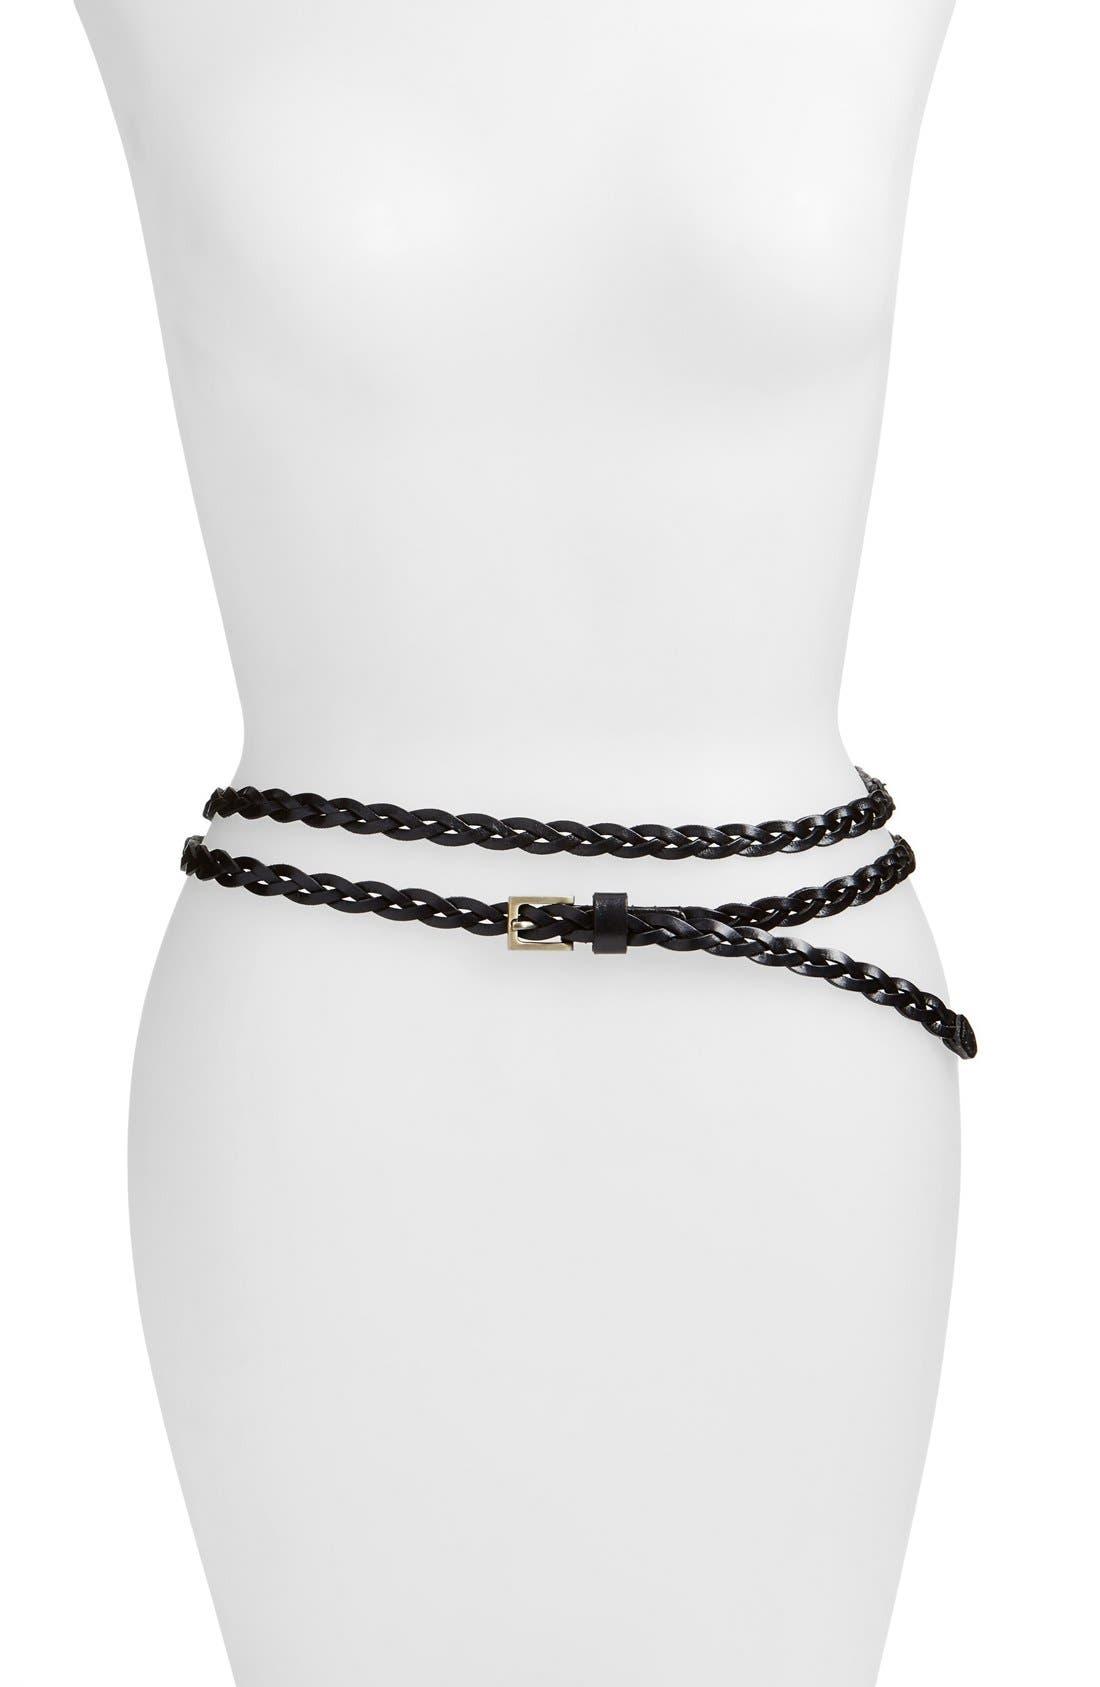 Alternate Image 1 Selected - Elise M. 'Florence' Calfskin Leather Double Wrap Belt